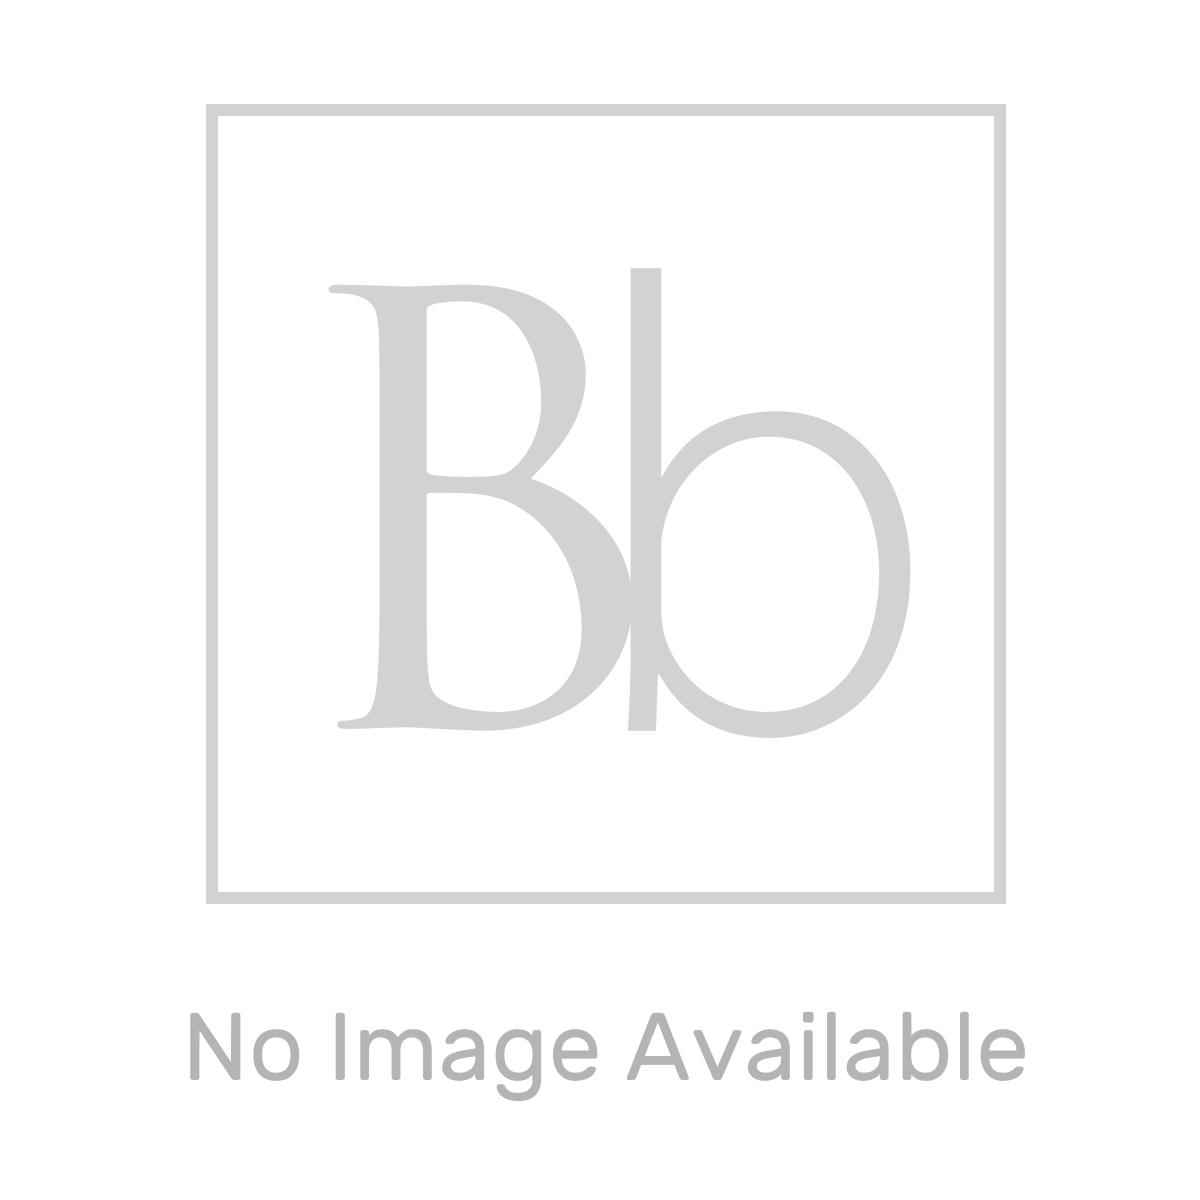 Salamander RP80SU 2.4 Bar Single Universal Whole House Shower Pump Right Side